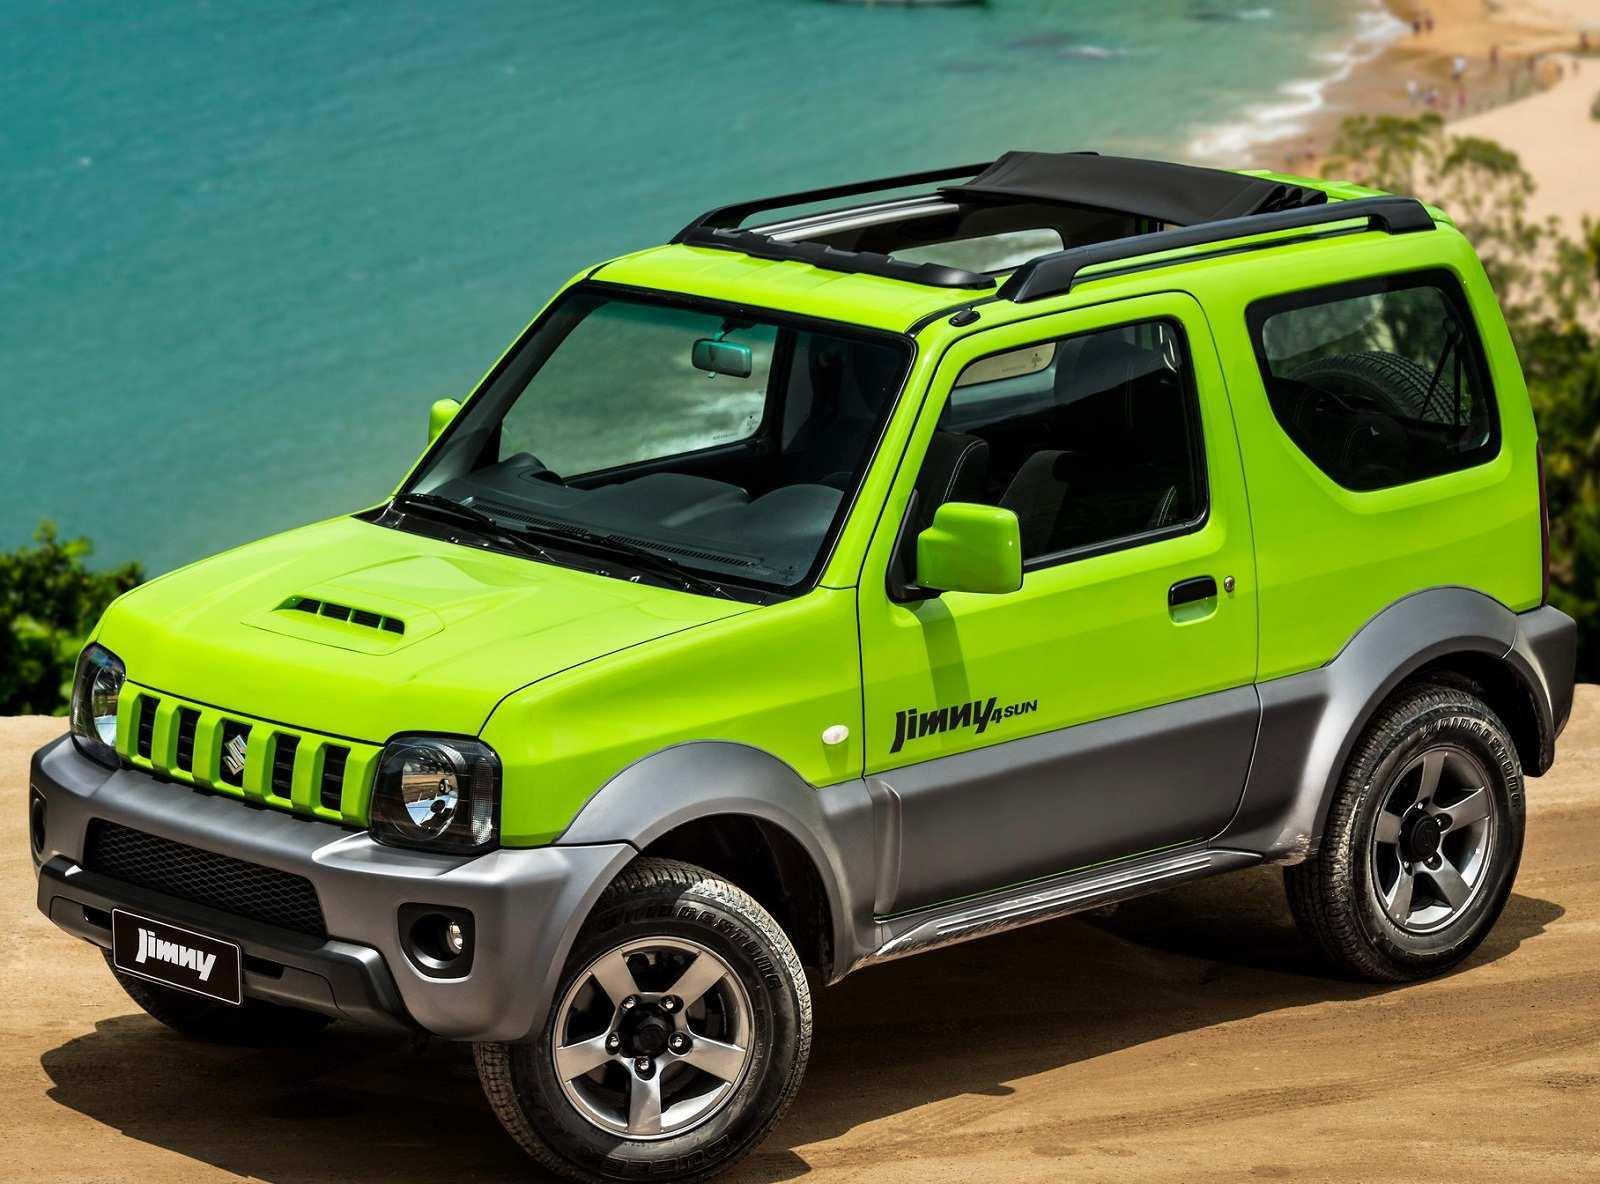 13 Best Review 2020 Suzuki Jimny Model Pictures with 2020 Suzuki Jimny Model